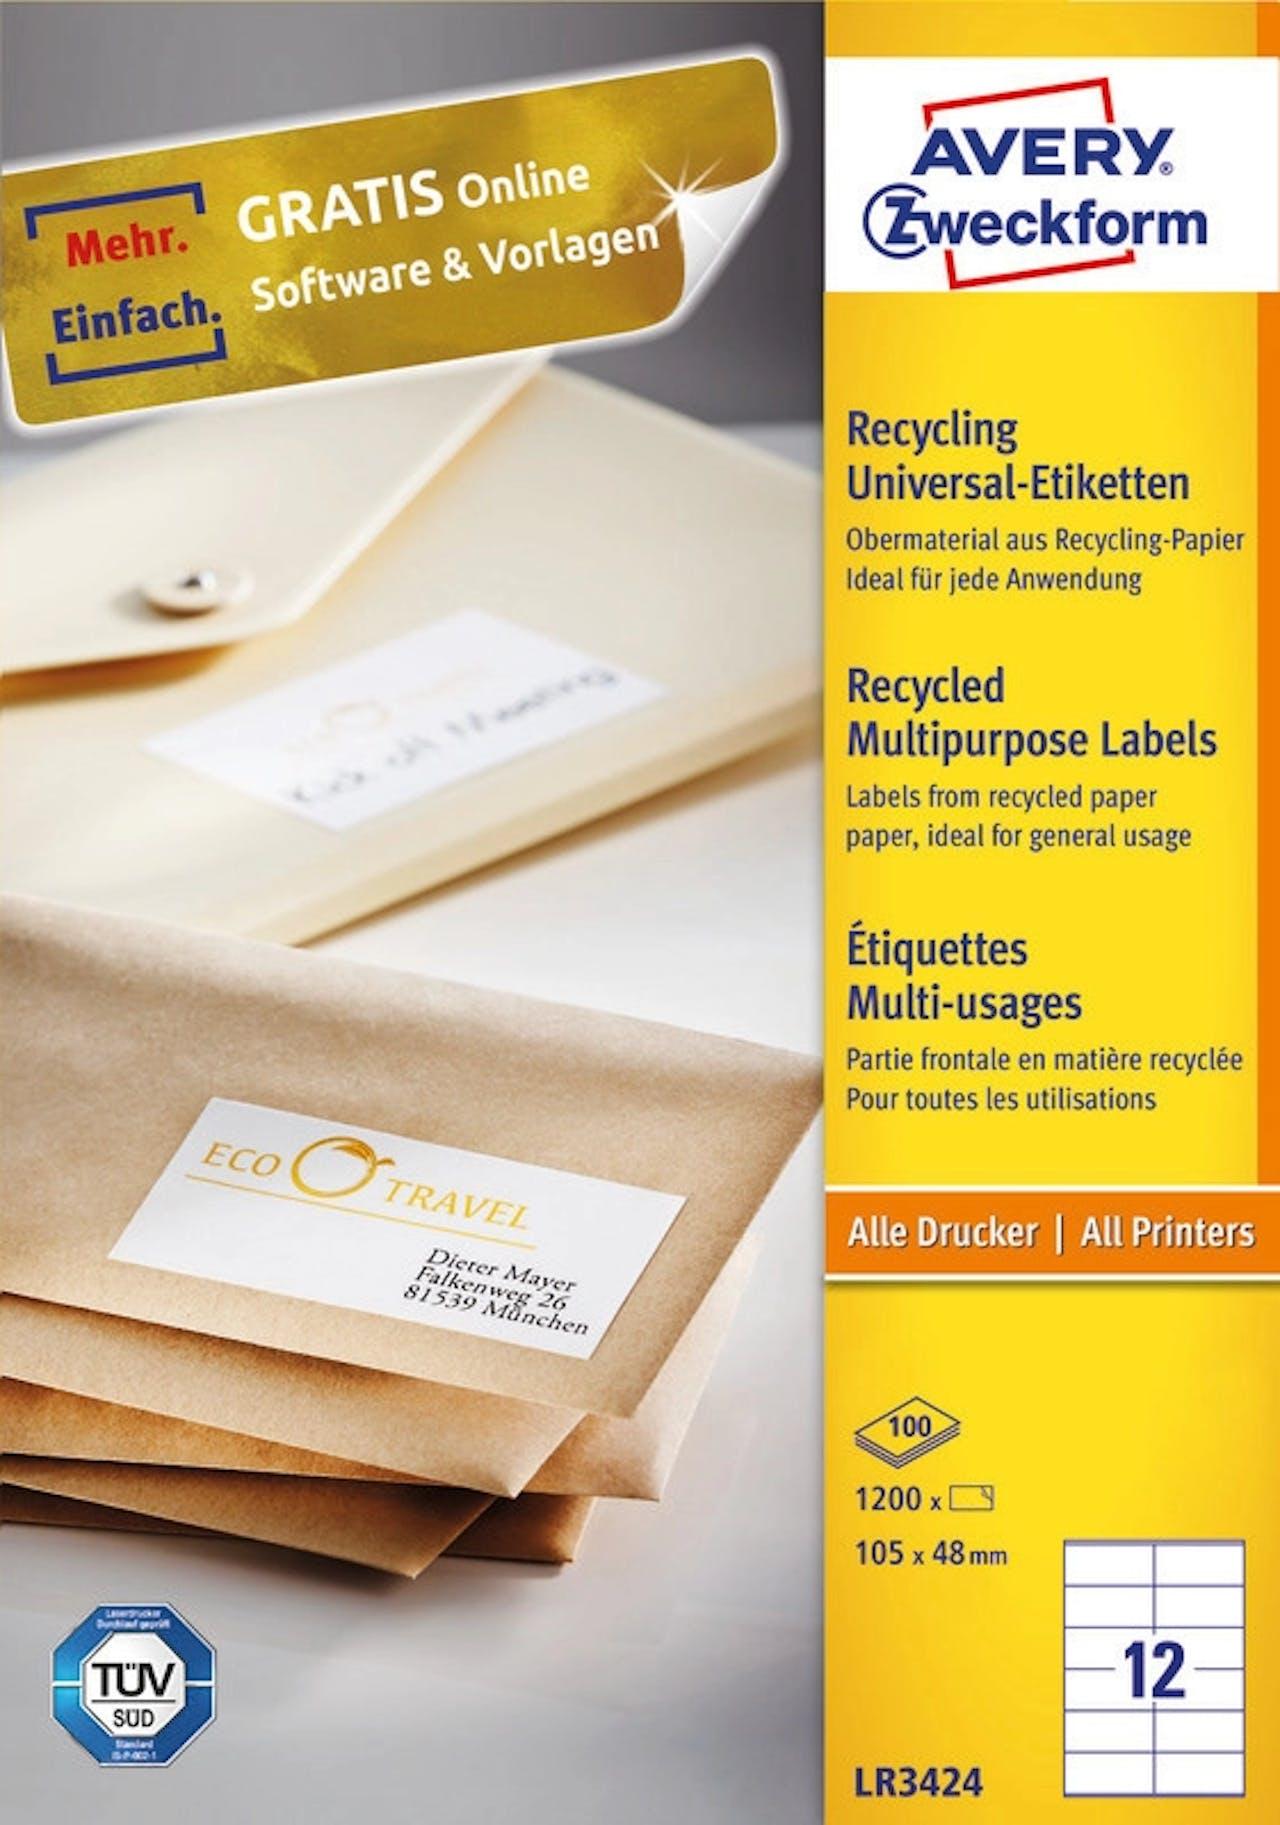 Recycling-Universaletiketten